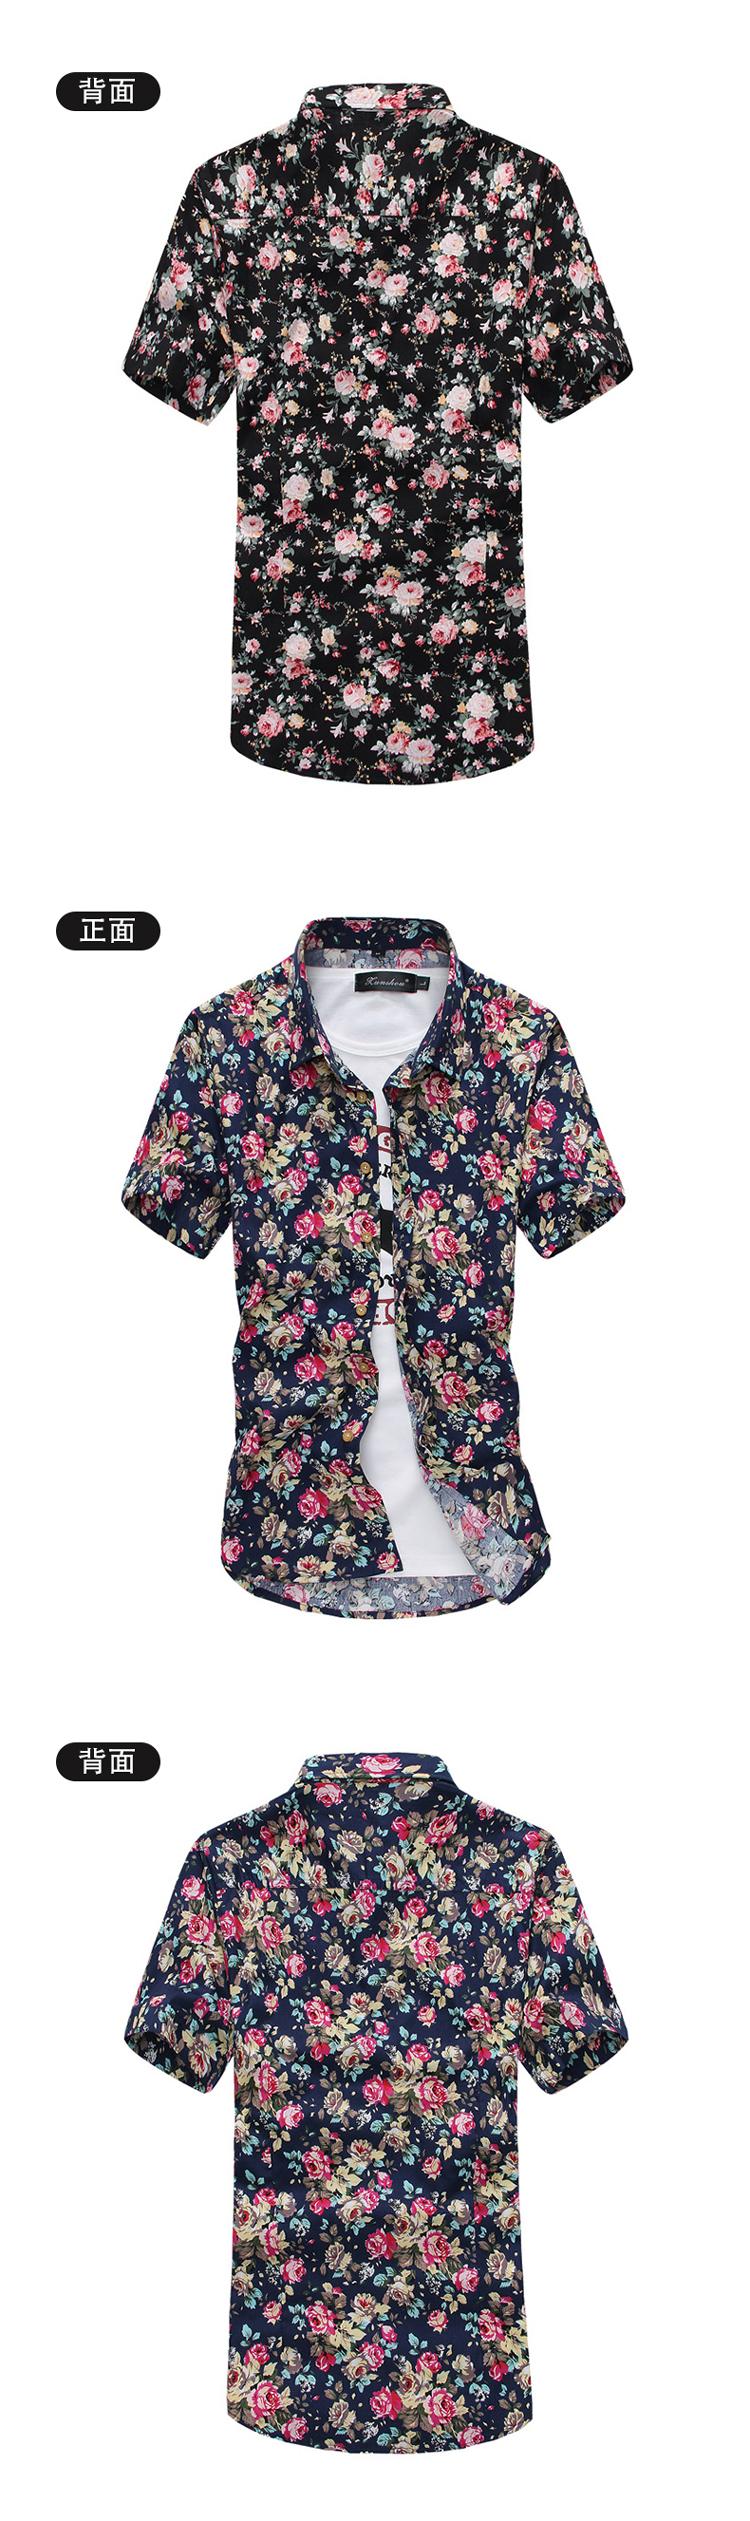 Men Summer Thin Shirts Short Sleeve Floral Shirts New Fashion Men Outwear Casual Slim Shirts Mens Cotton dress shirts 11